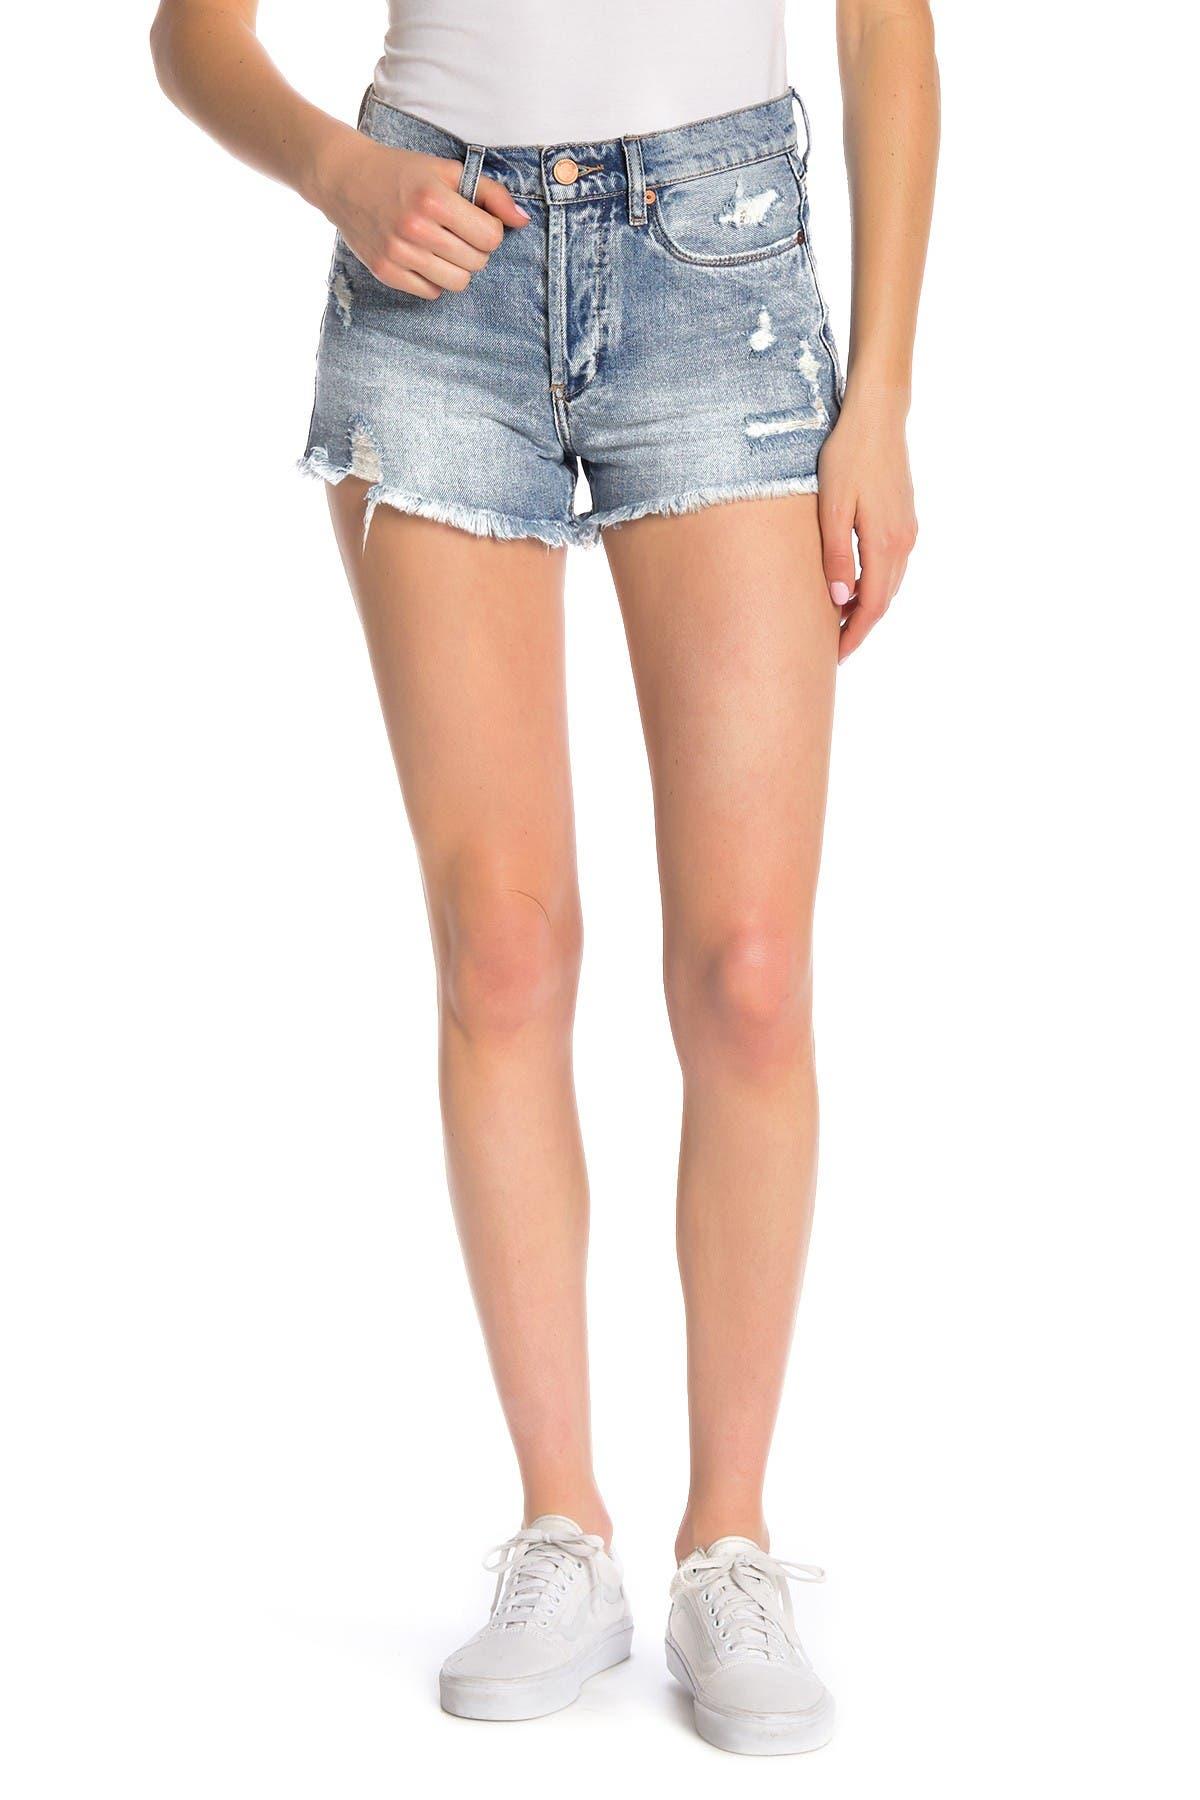 Image of BLANKNYC Denim High-Rise Distressed Denim Shorts